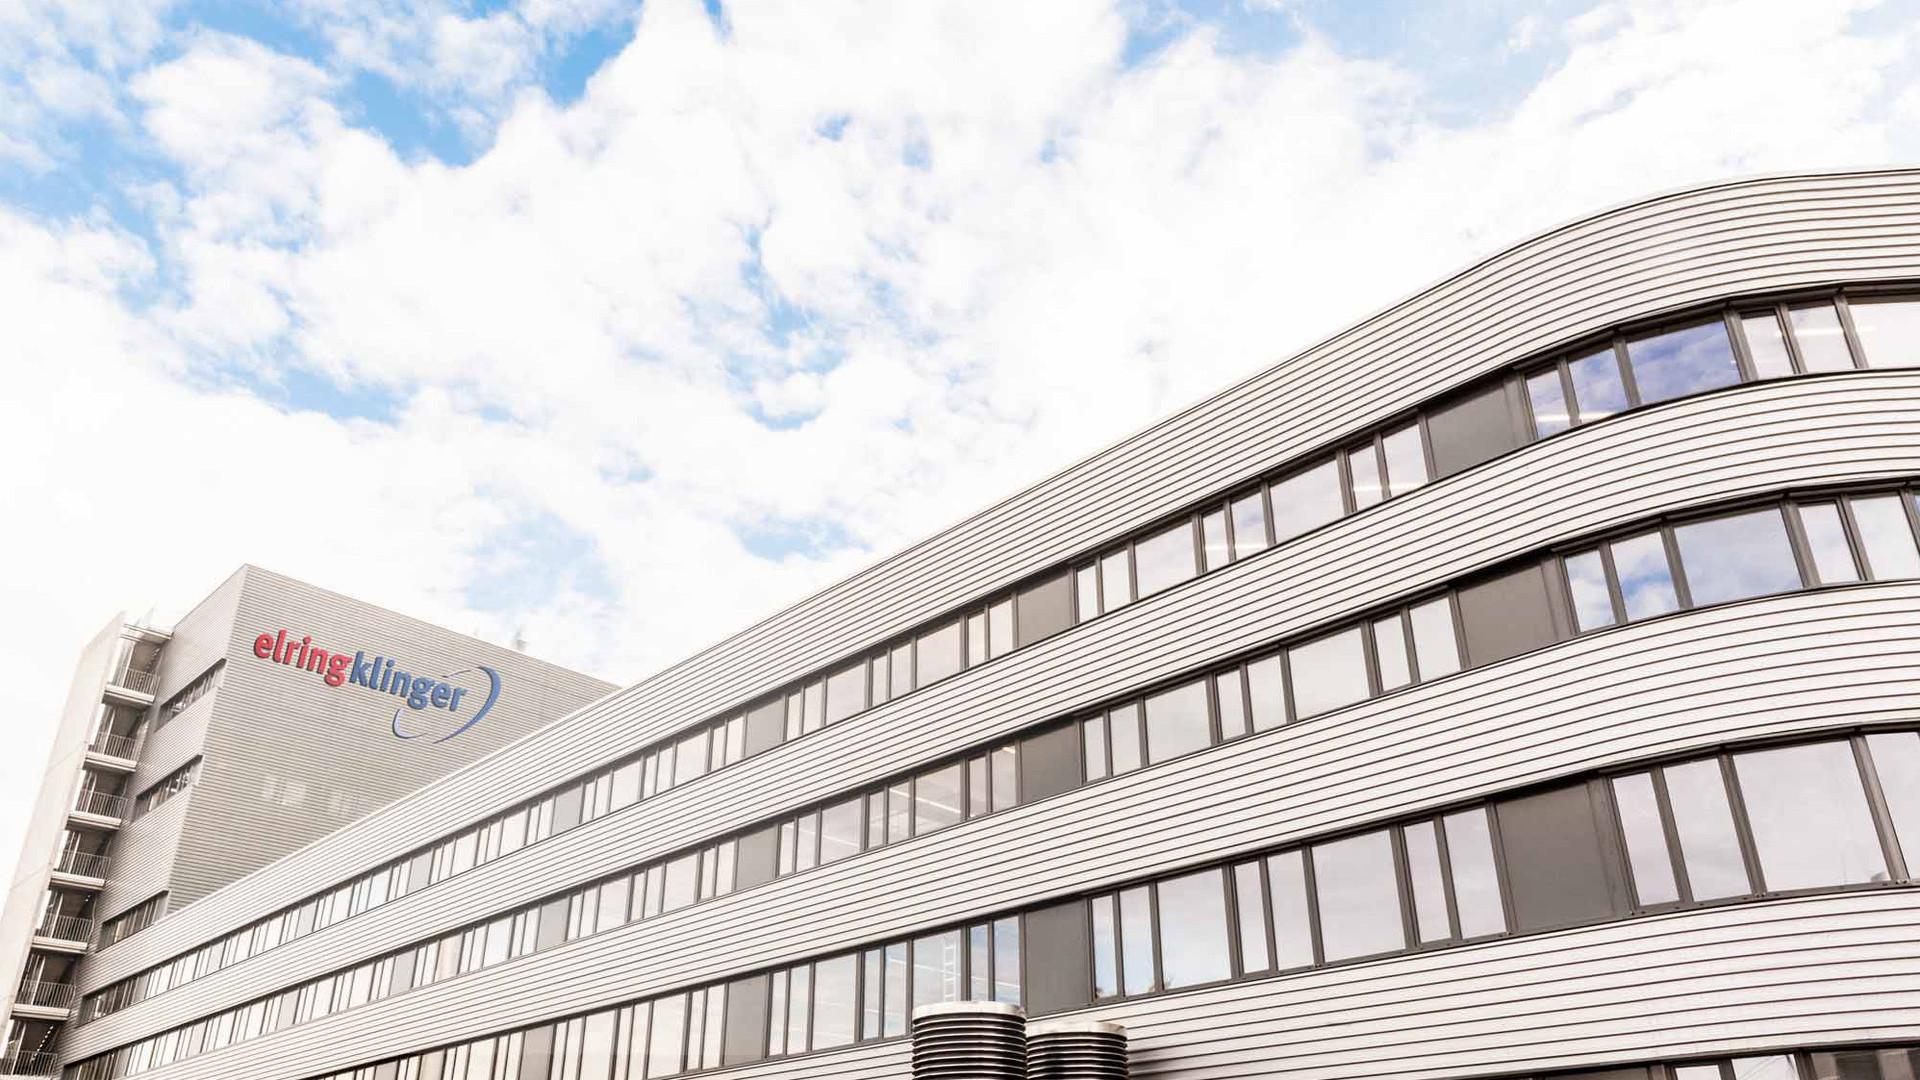 [Translate to Koreanisch:] ElringKlinger Kunststofftechnik GmbH Bietigheim-Bissingen new production building